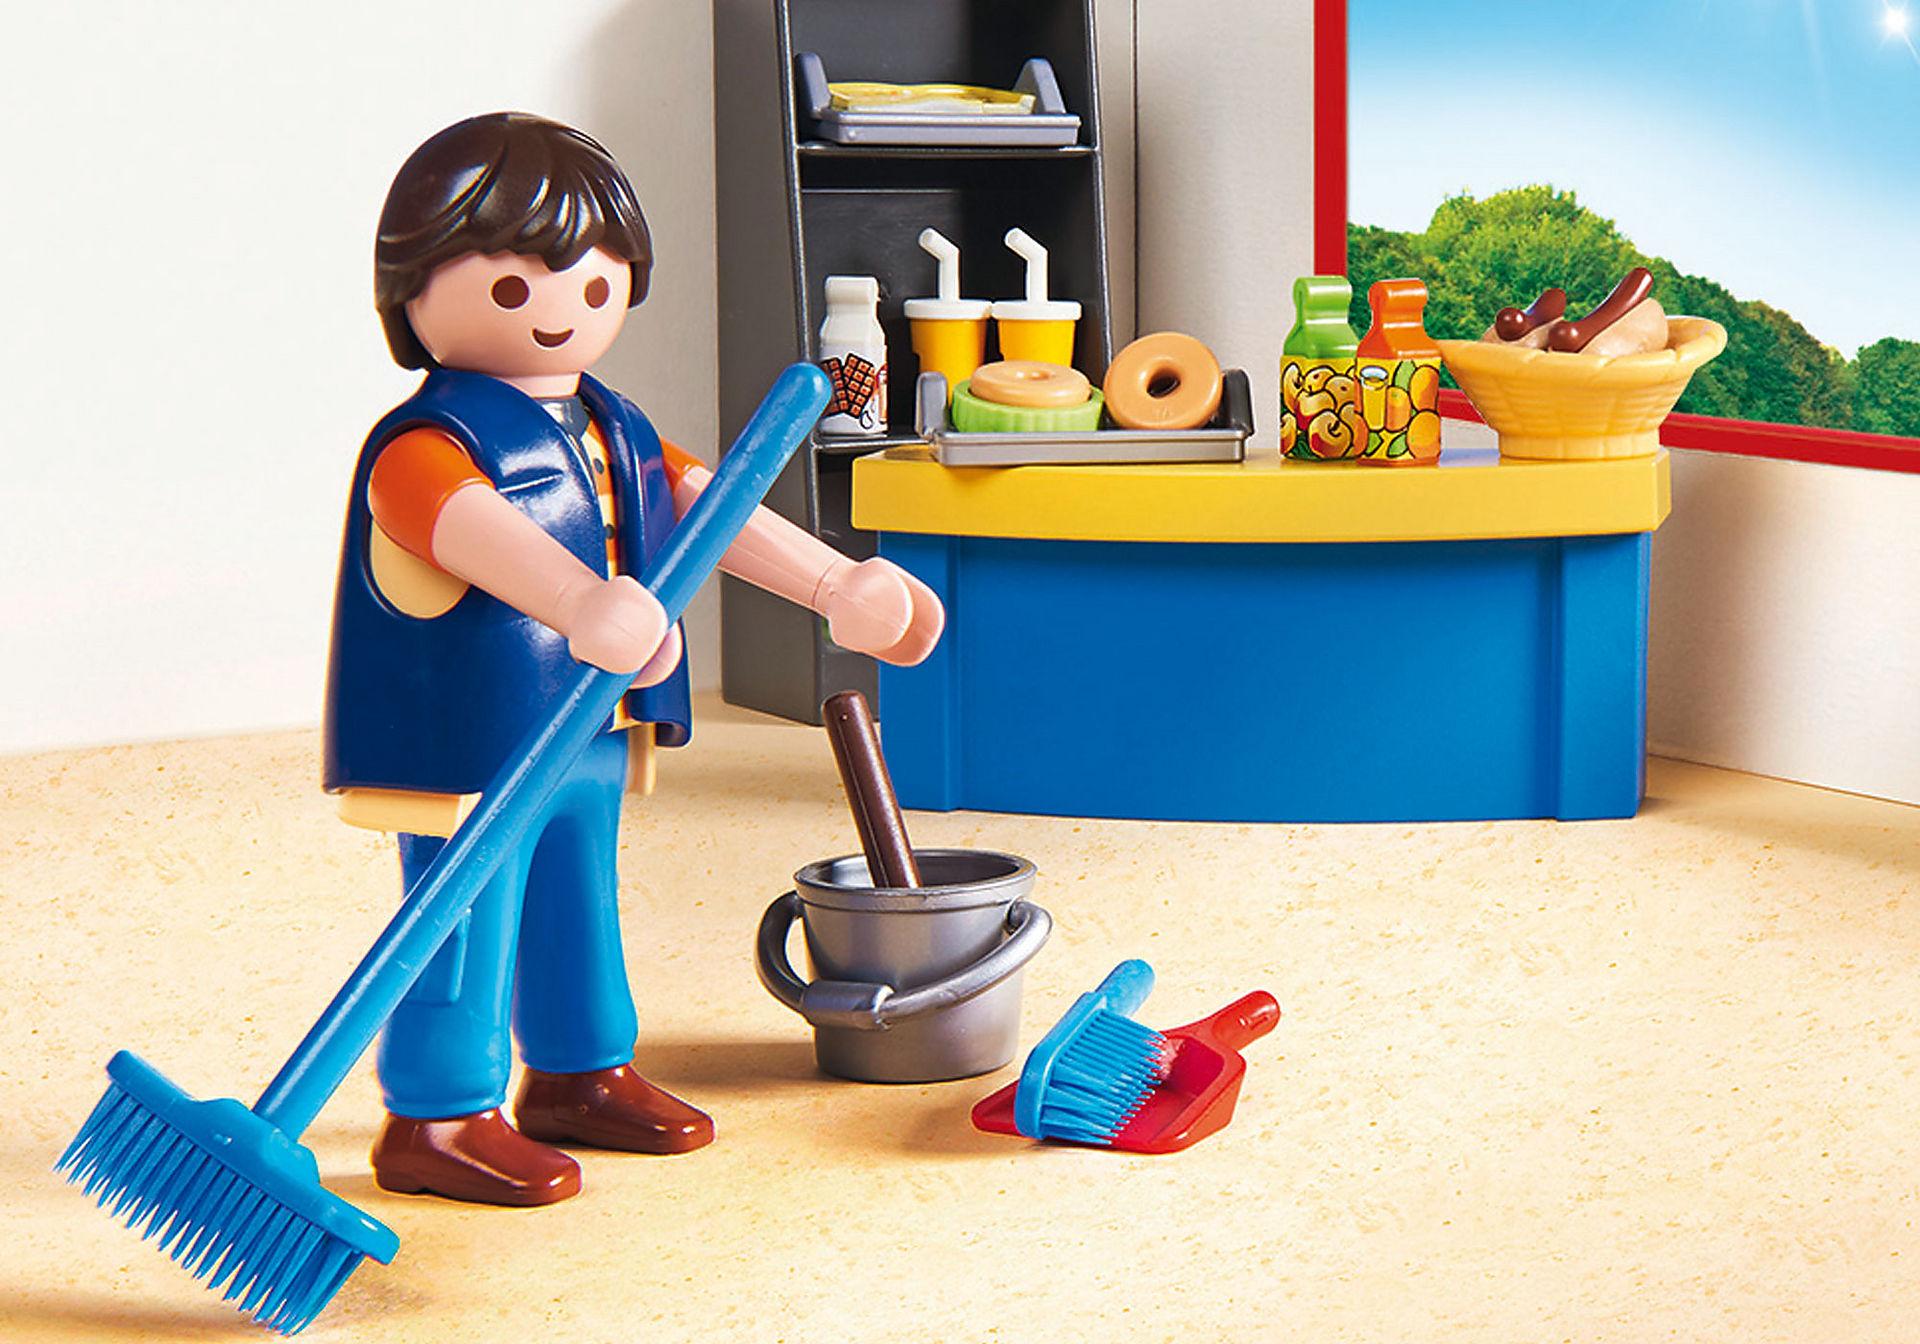 http://media.playmobil.com/i/playmobil/9457_product_extra1/Hausmeister mit Kiosk